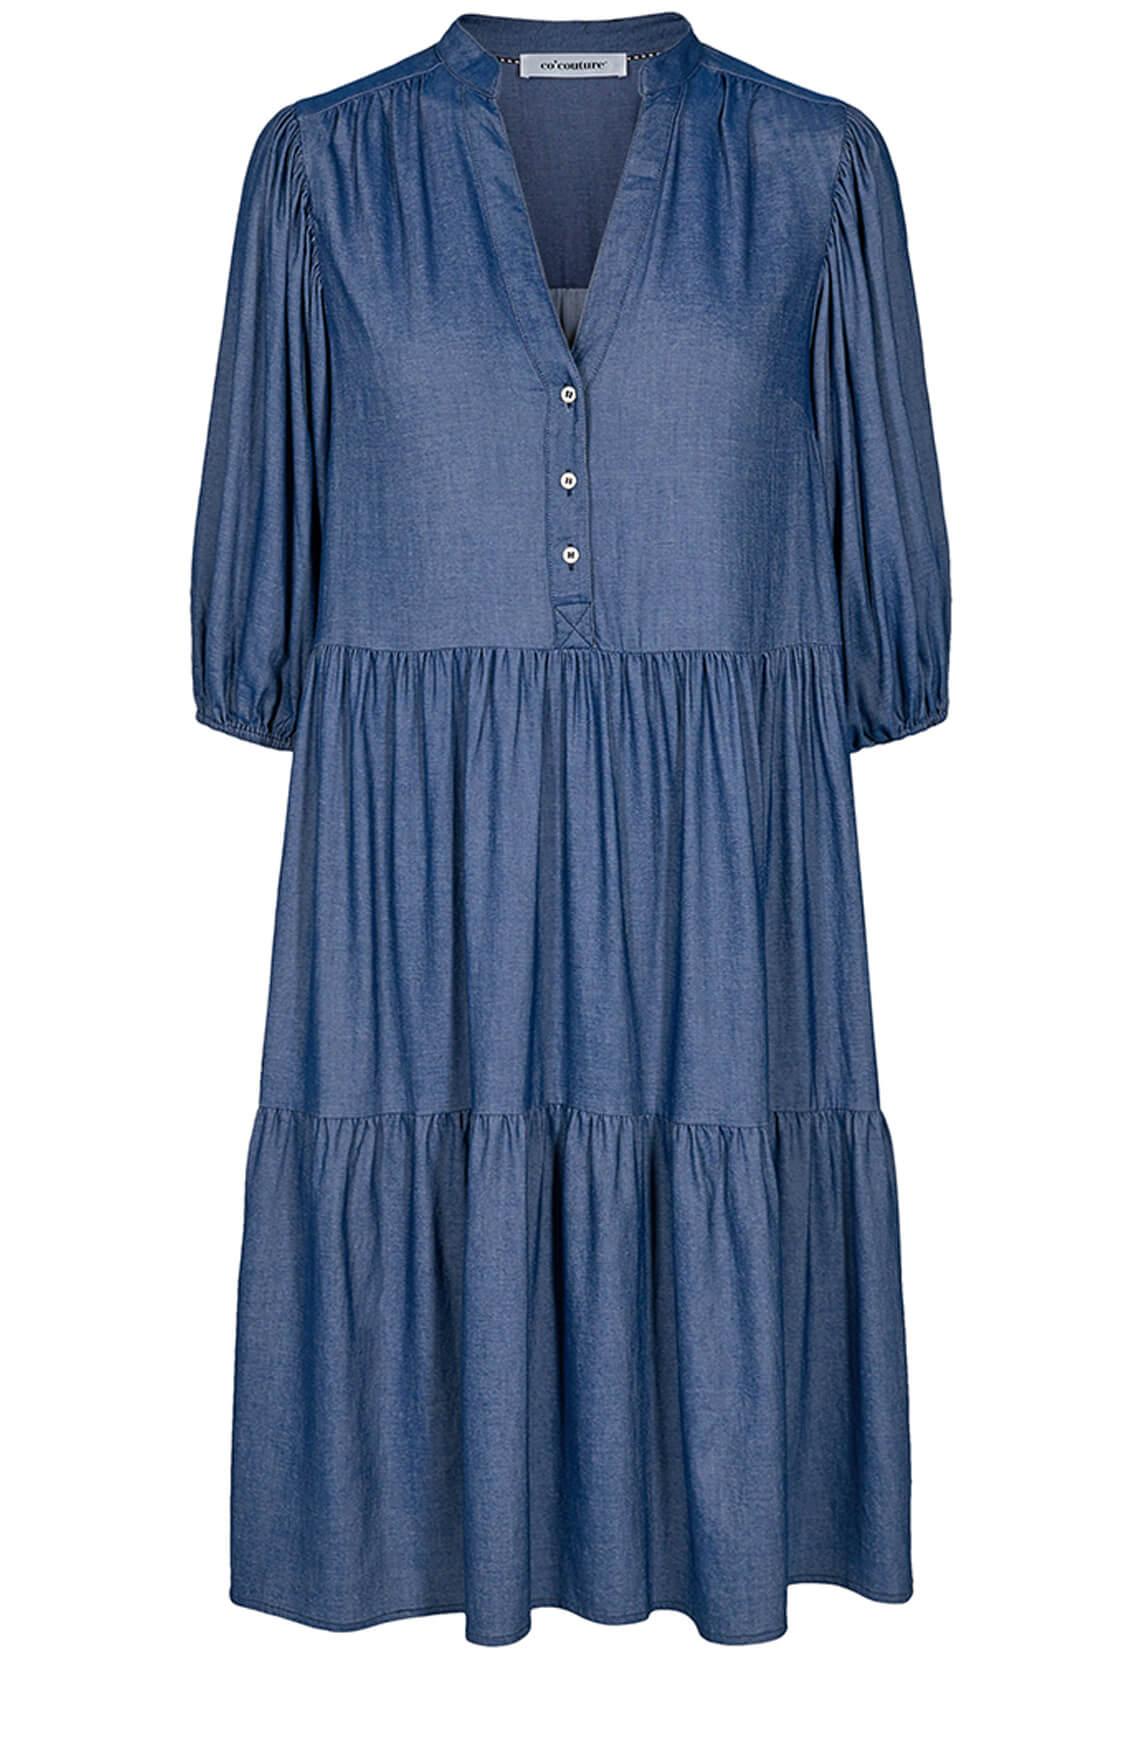 Co Couture Dames Cream denim jurk Blauw